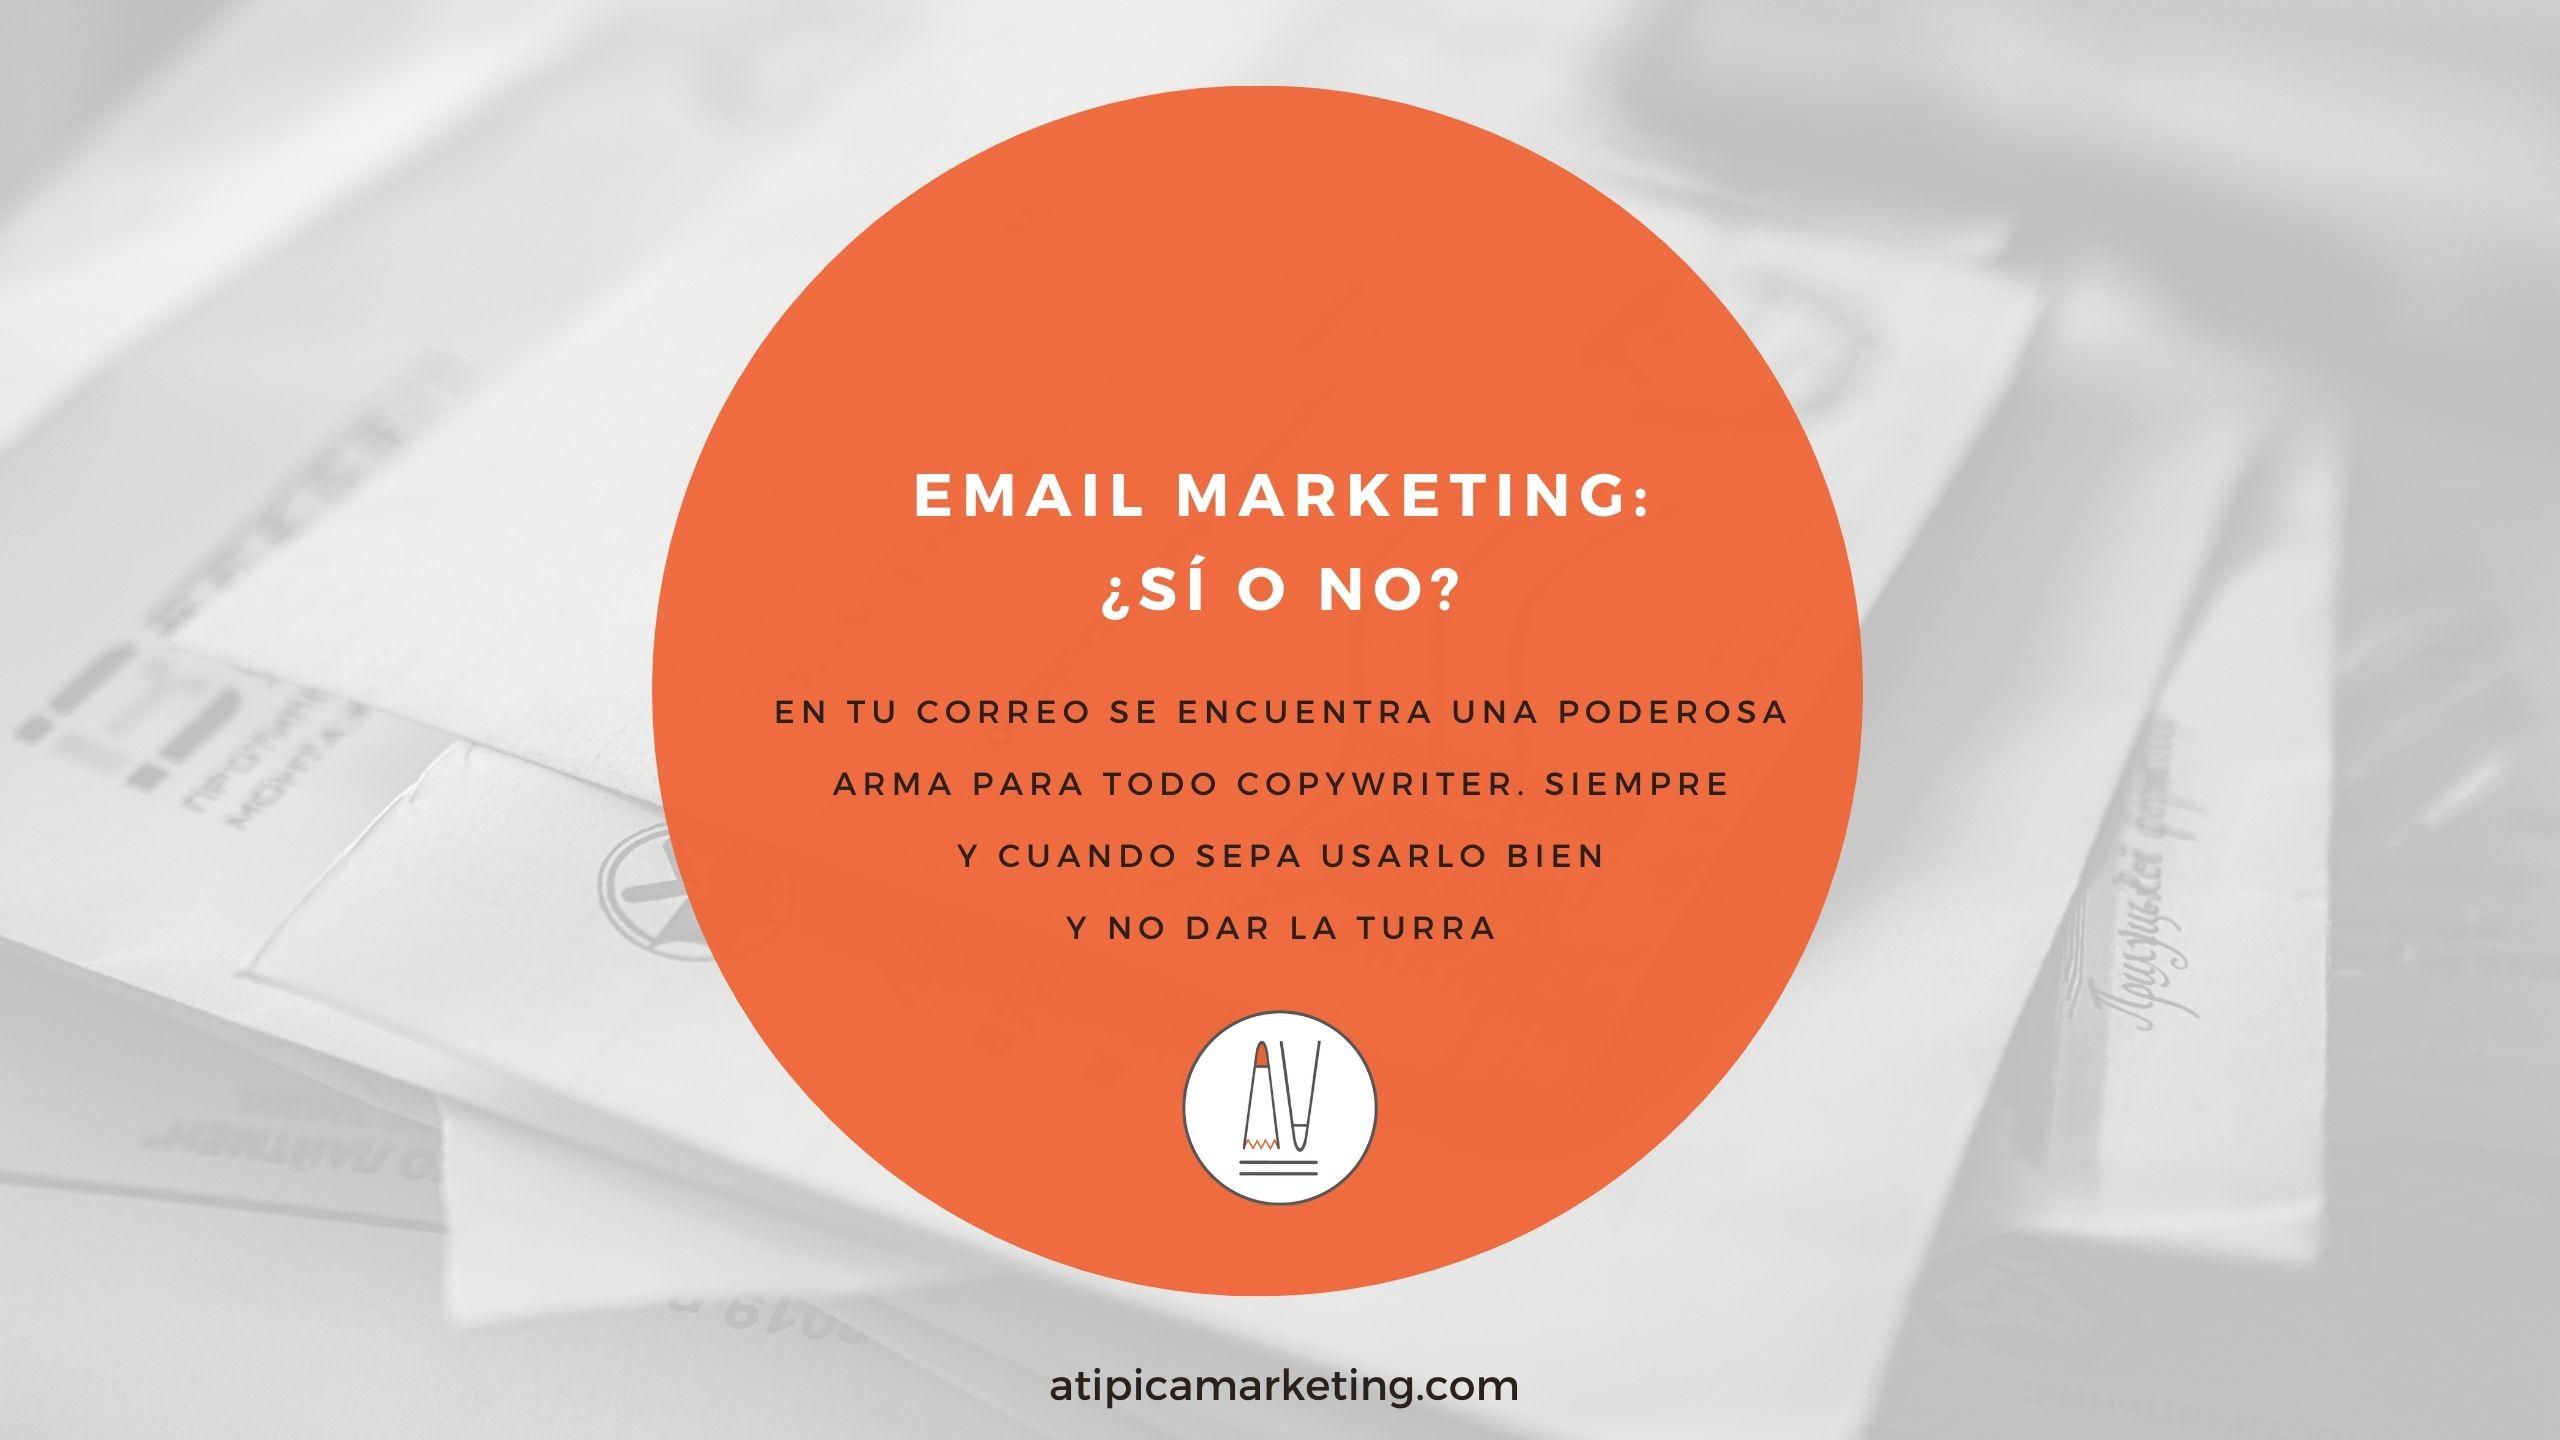 Email marketing si o no